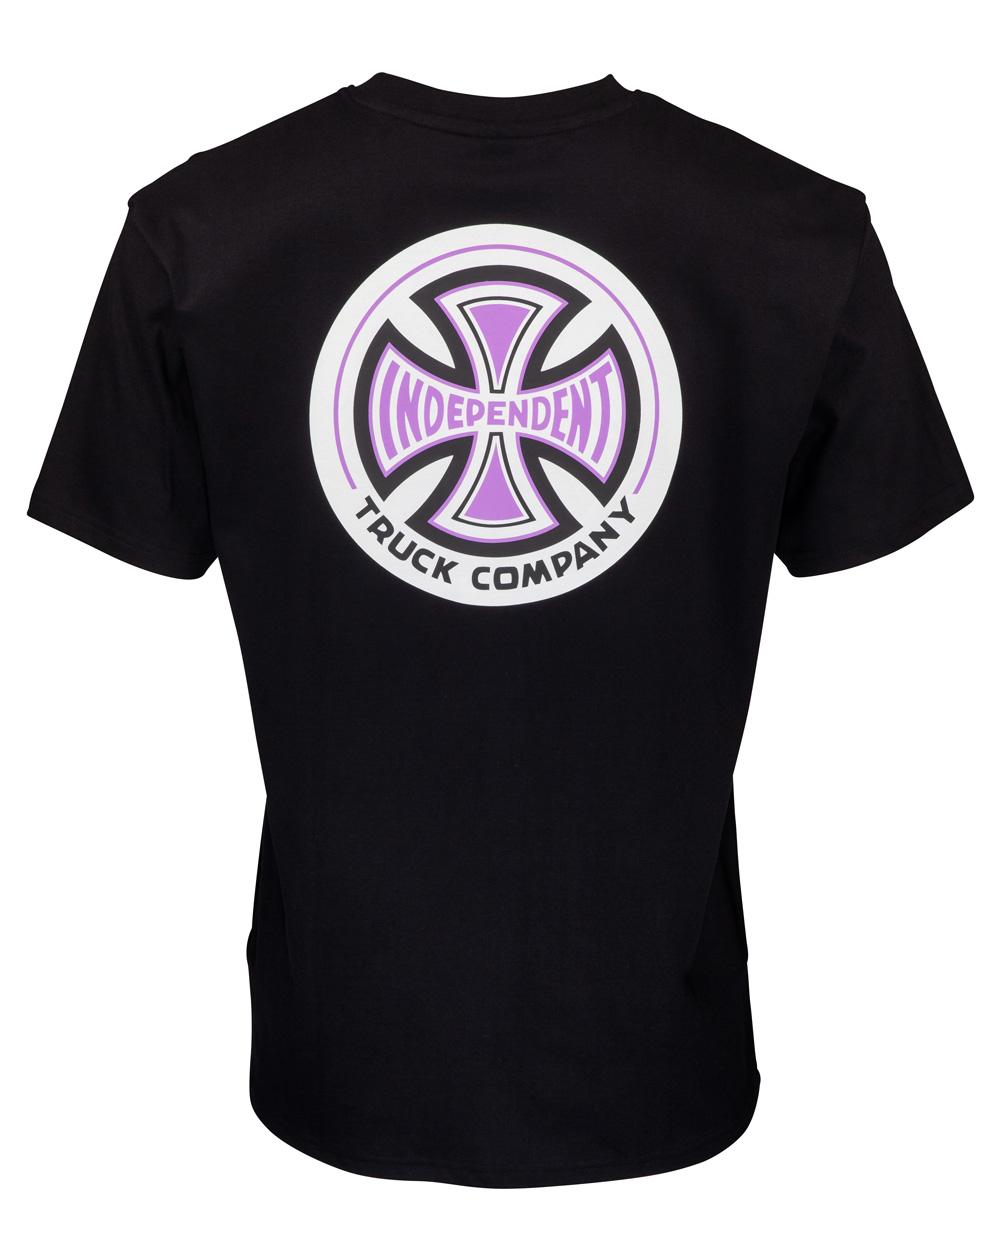 Independent 78 Cross Camiseta para Homem Black